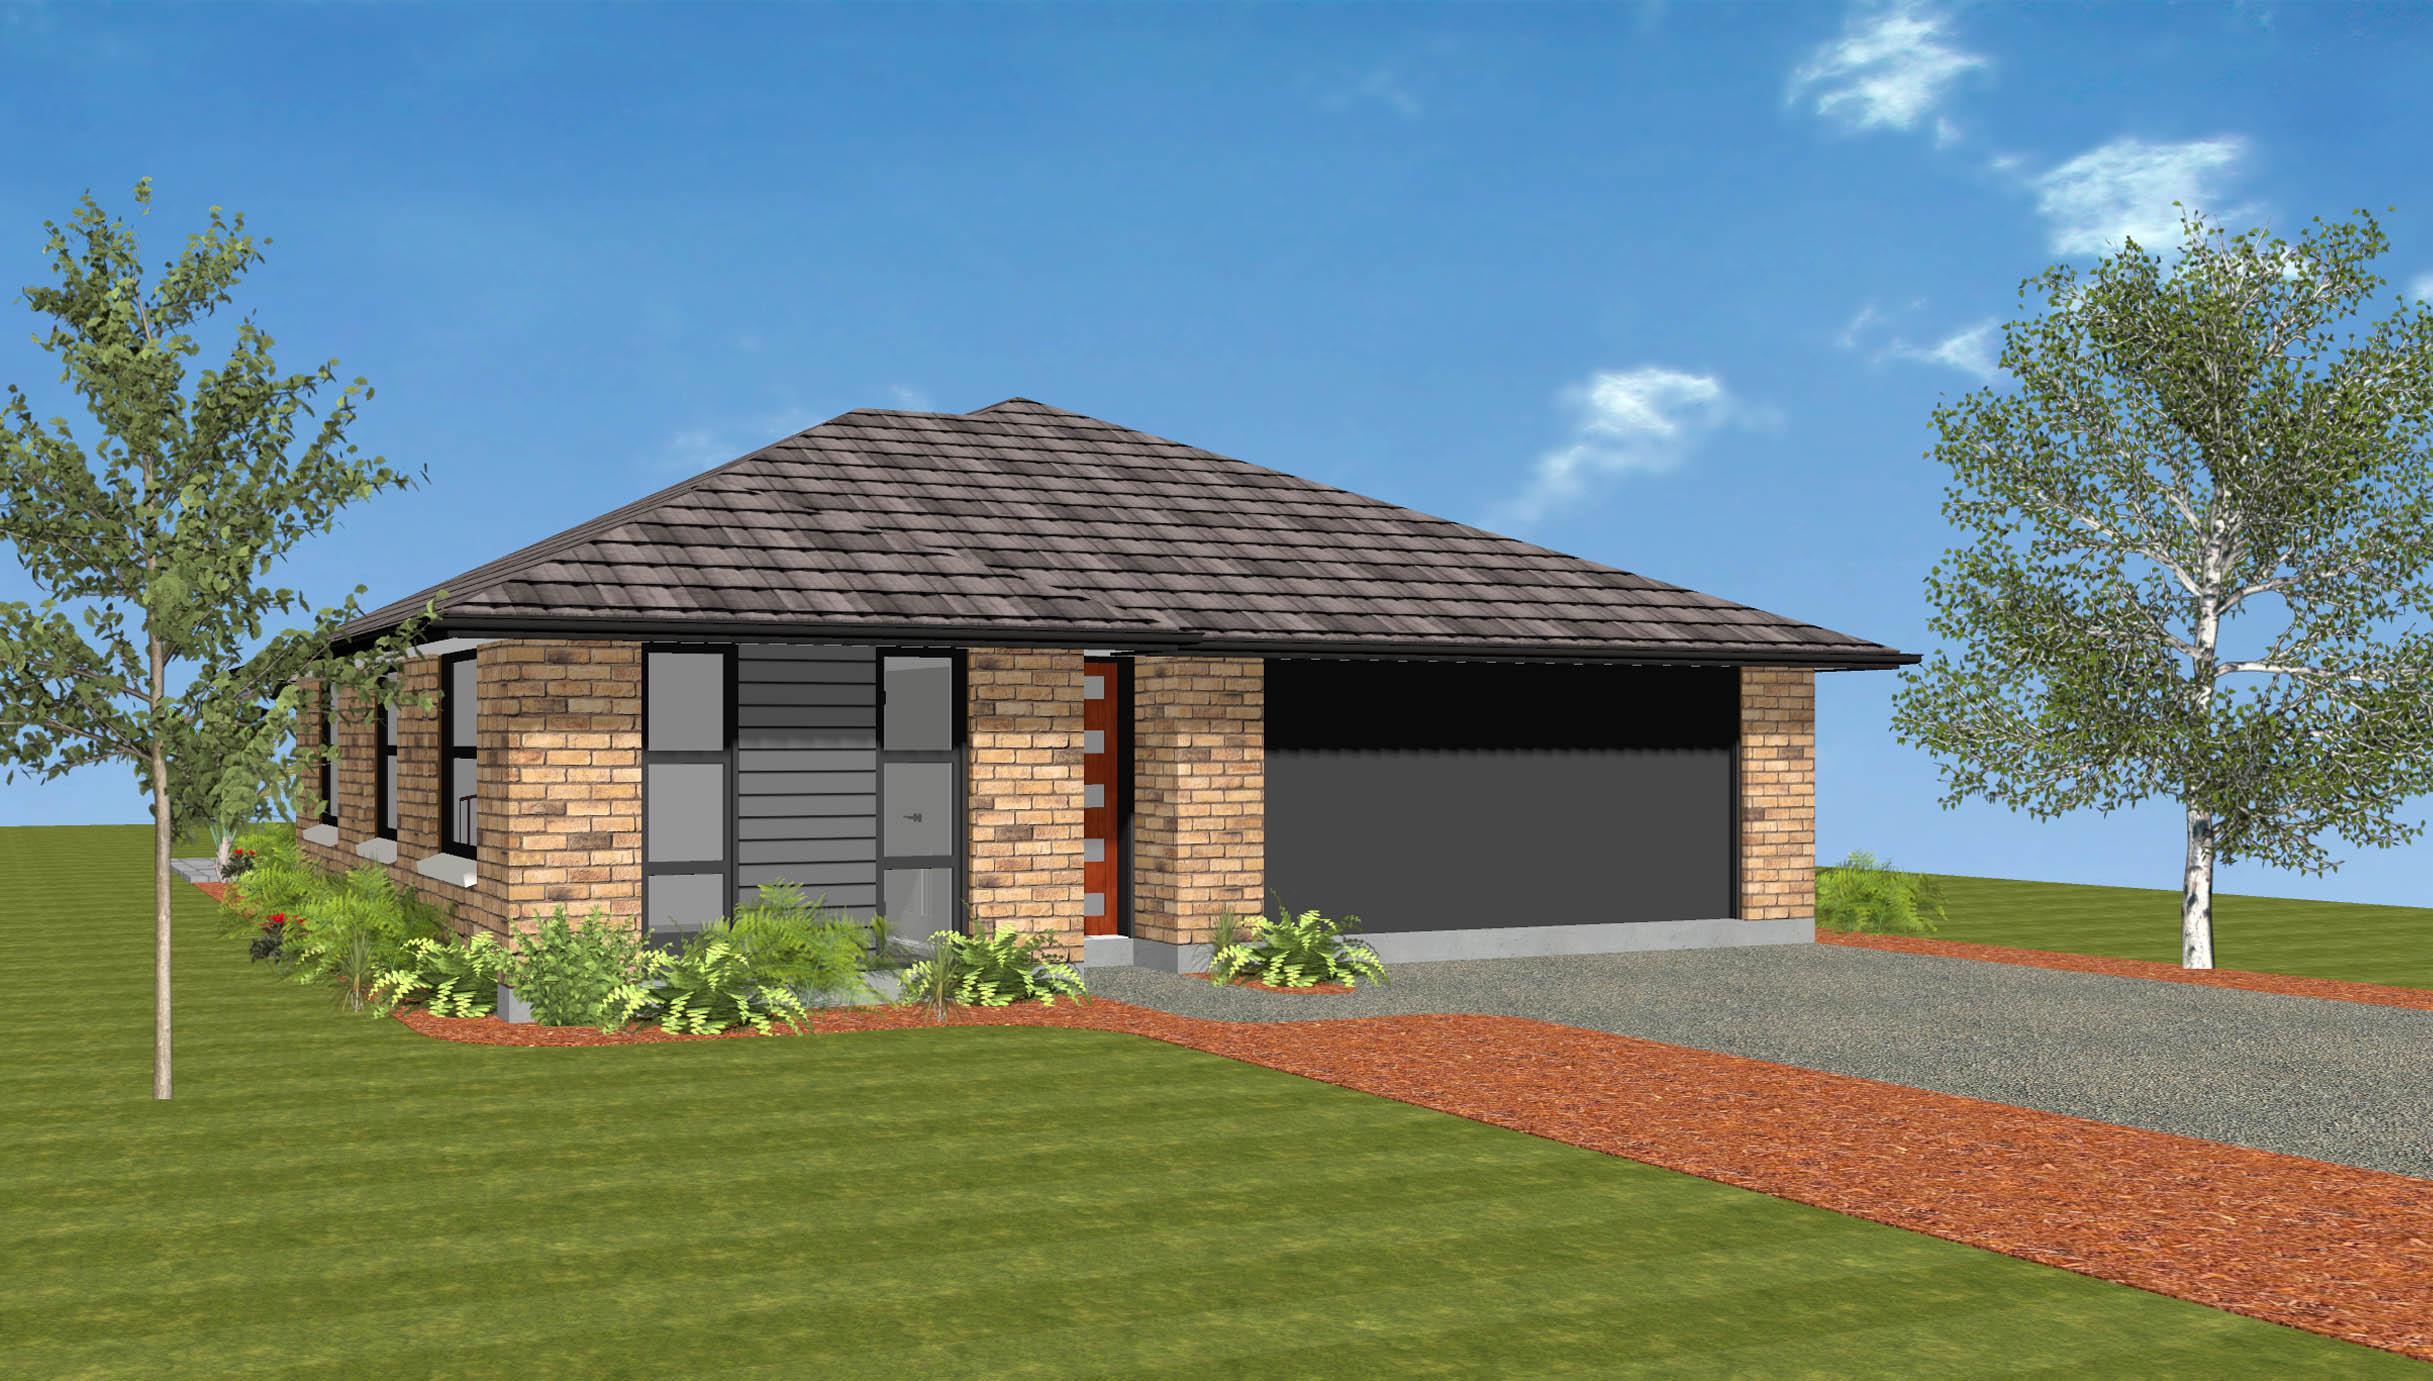 Dorset new house plan and design wellington kapiti for Wellington house designs